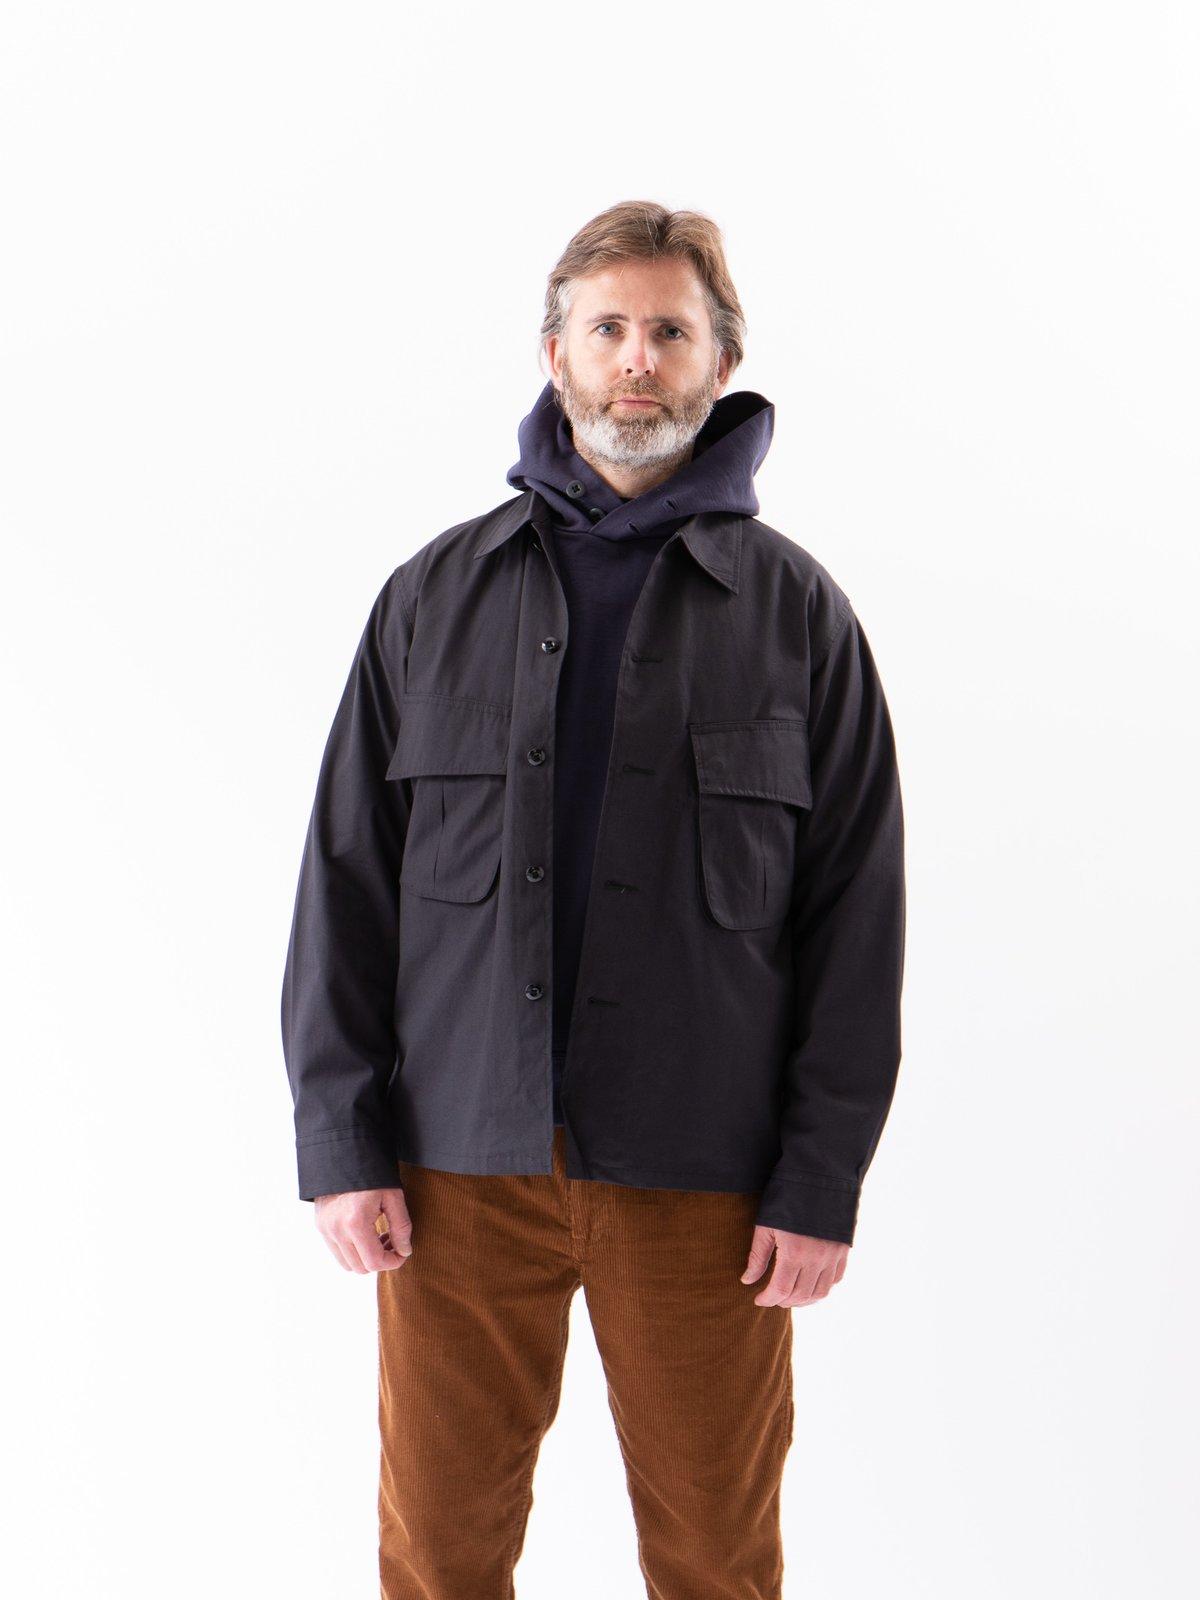 Fade Black Selvedge Poplin Cotton Combat Short Jacket - Image 2